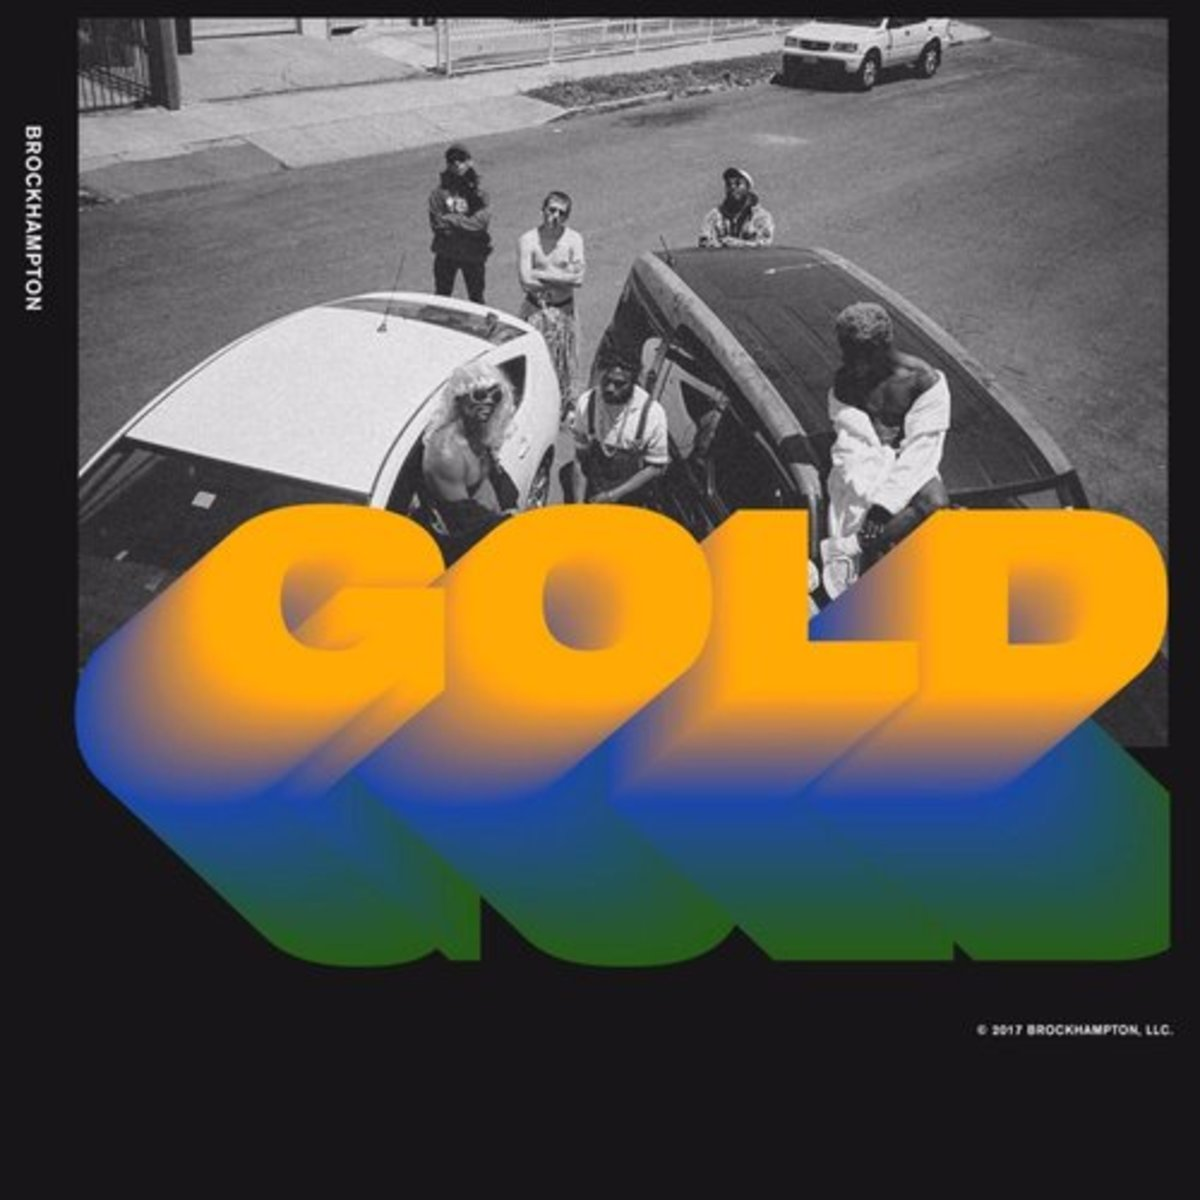 brockhampton-gold.jpg